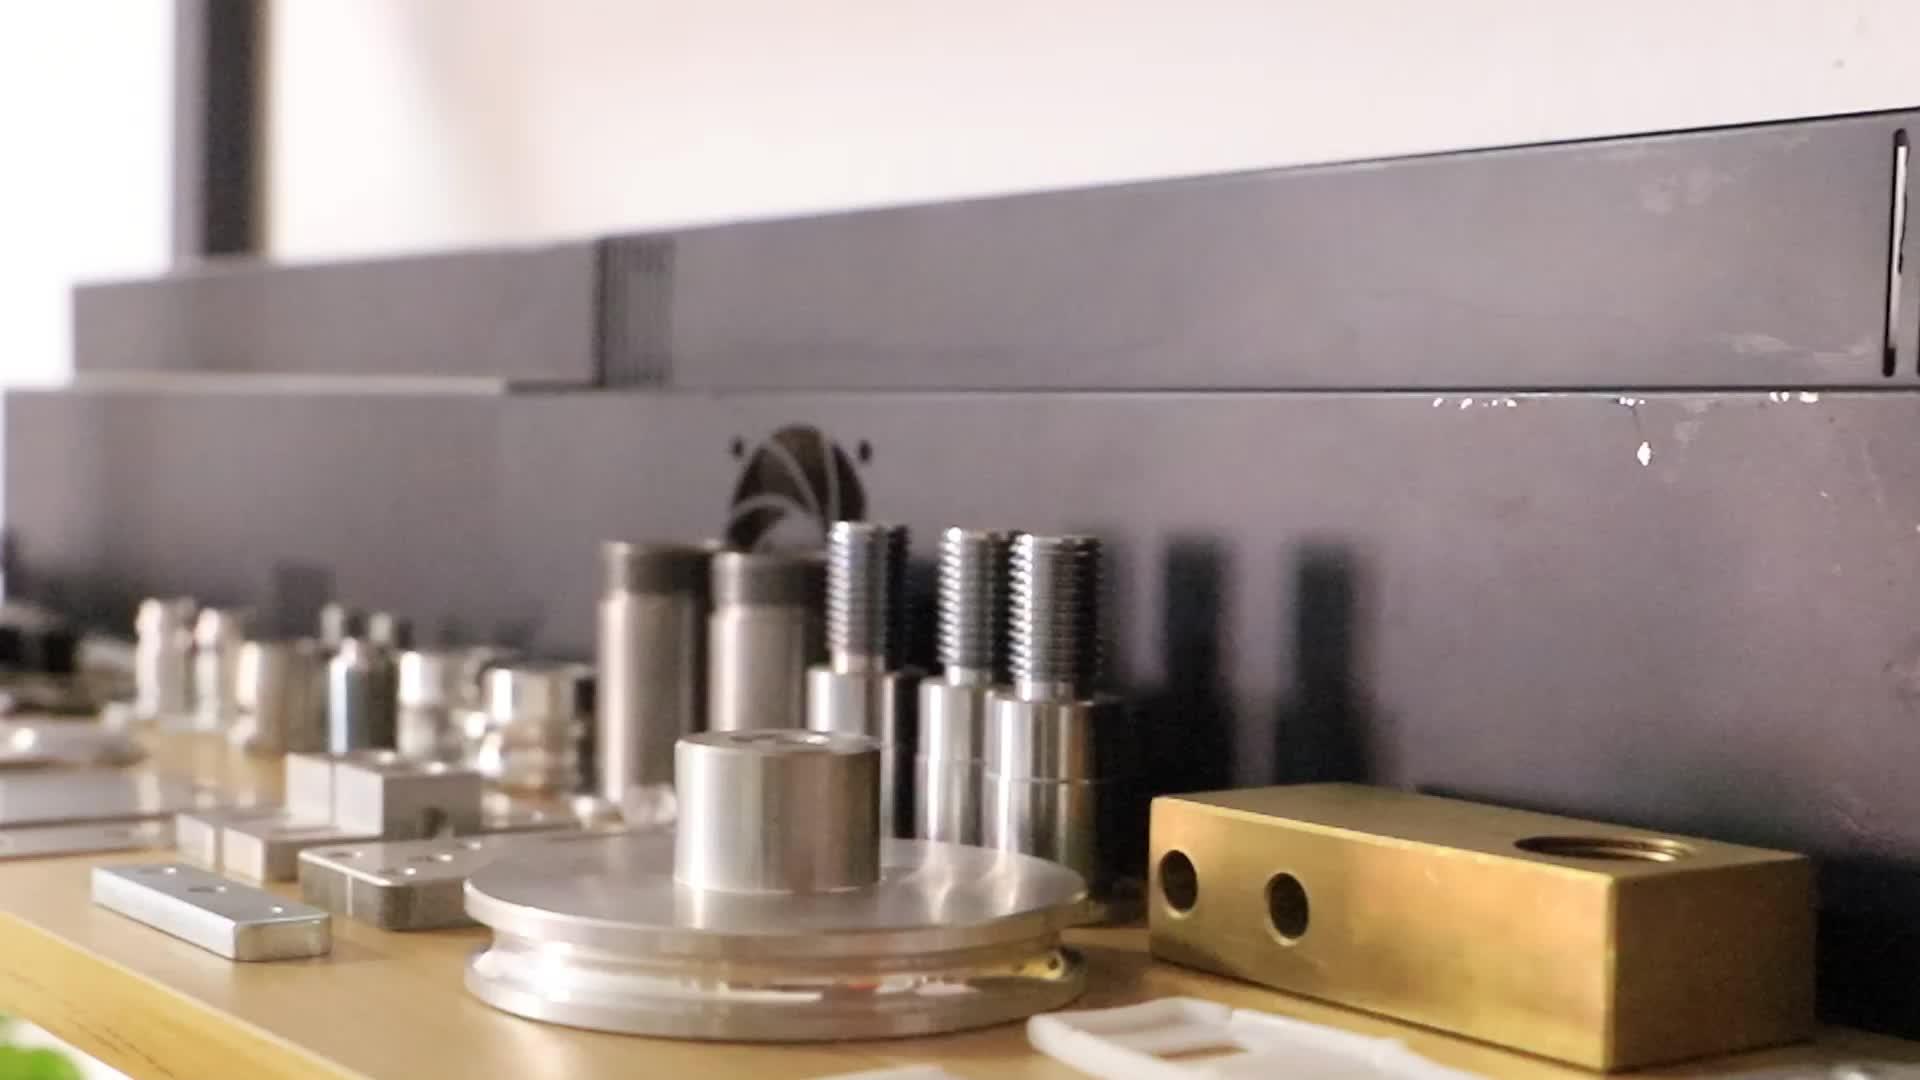 कस्टम सीएनसी लकड़ी मशीनिंग मिलिंग मशीन हिस्सा है और घटक